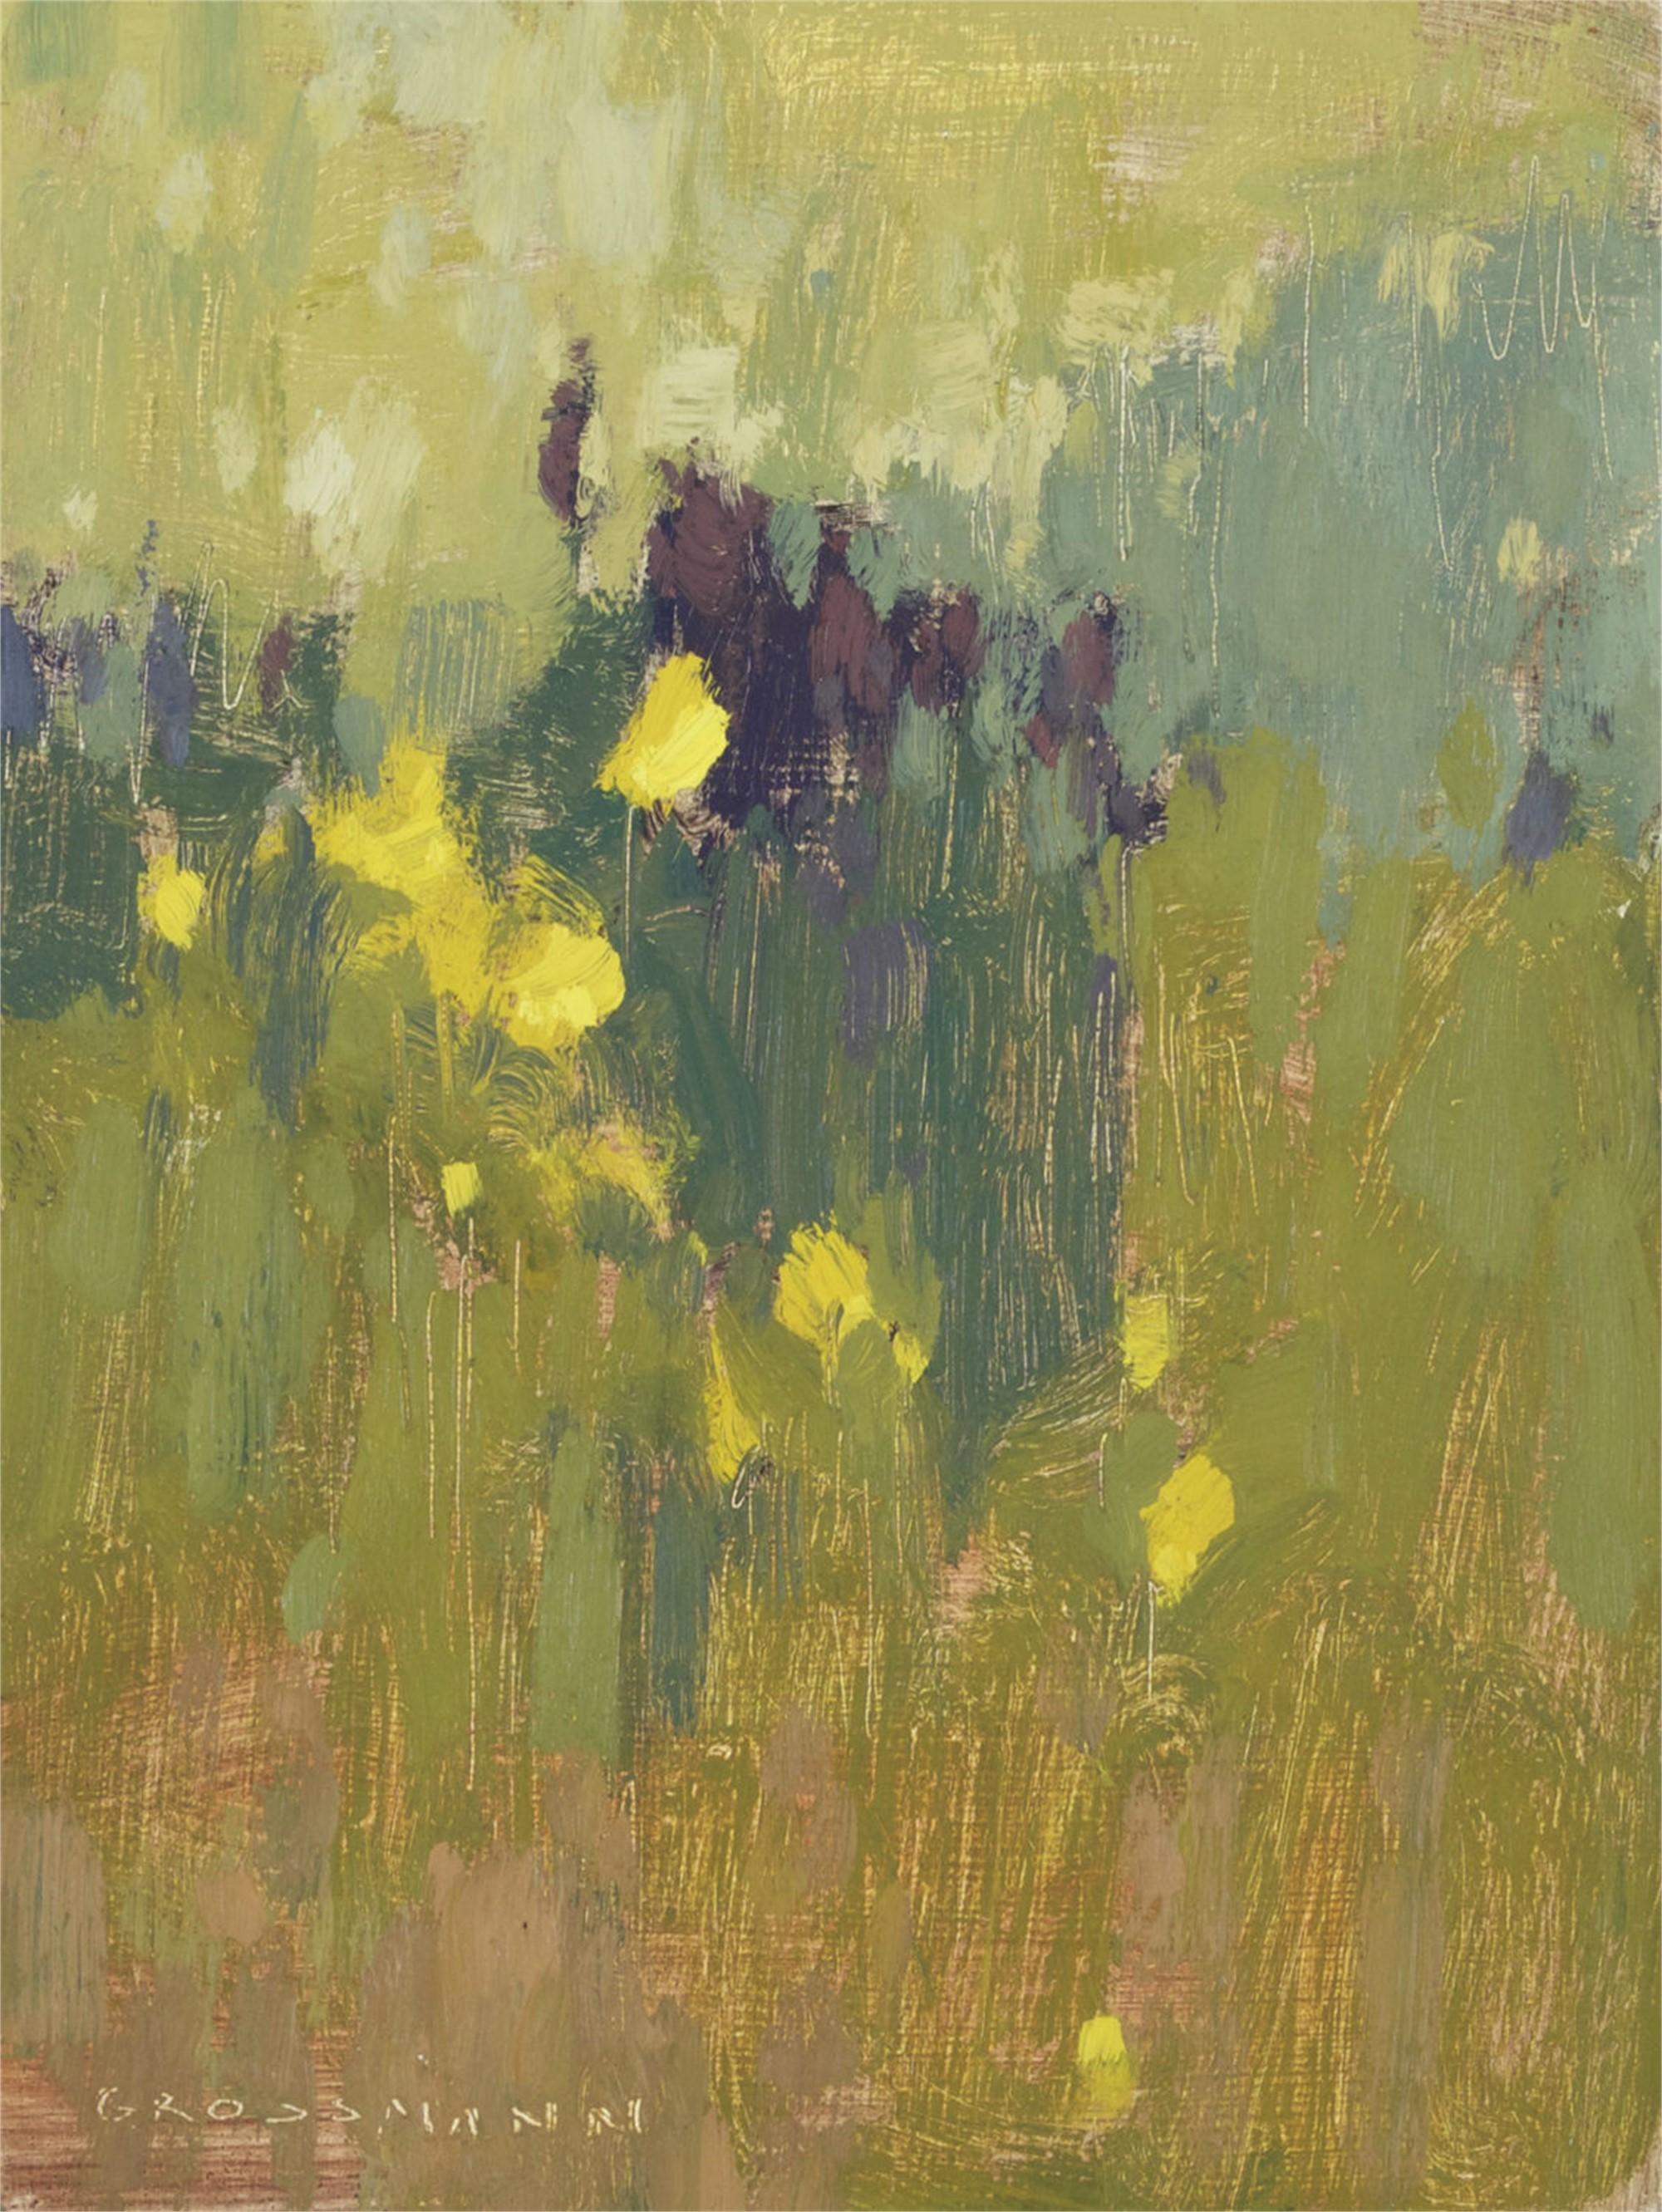 Wildflower Patterns, Monday by David Grossmann